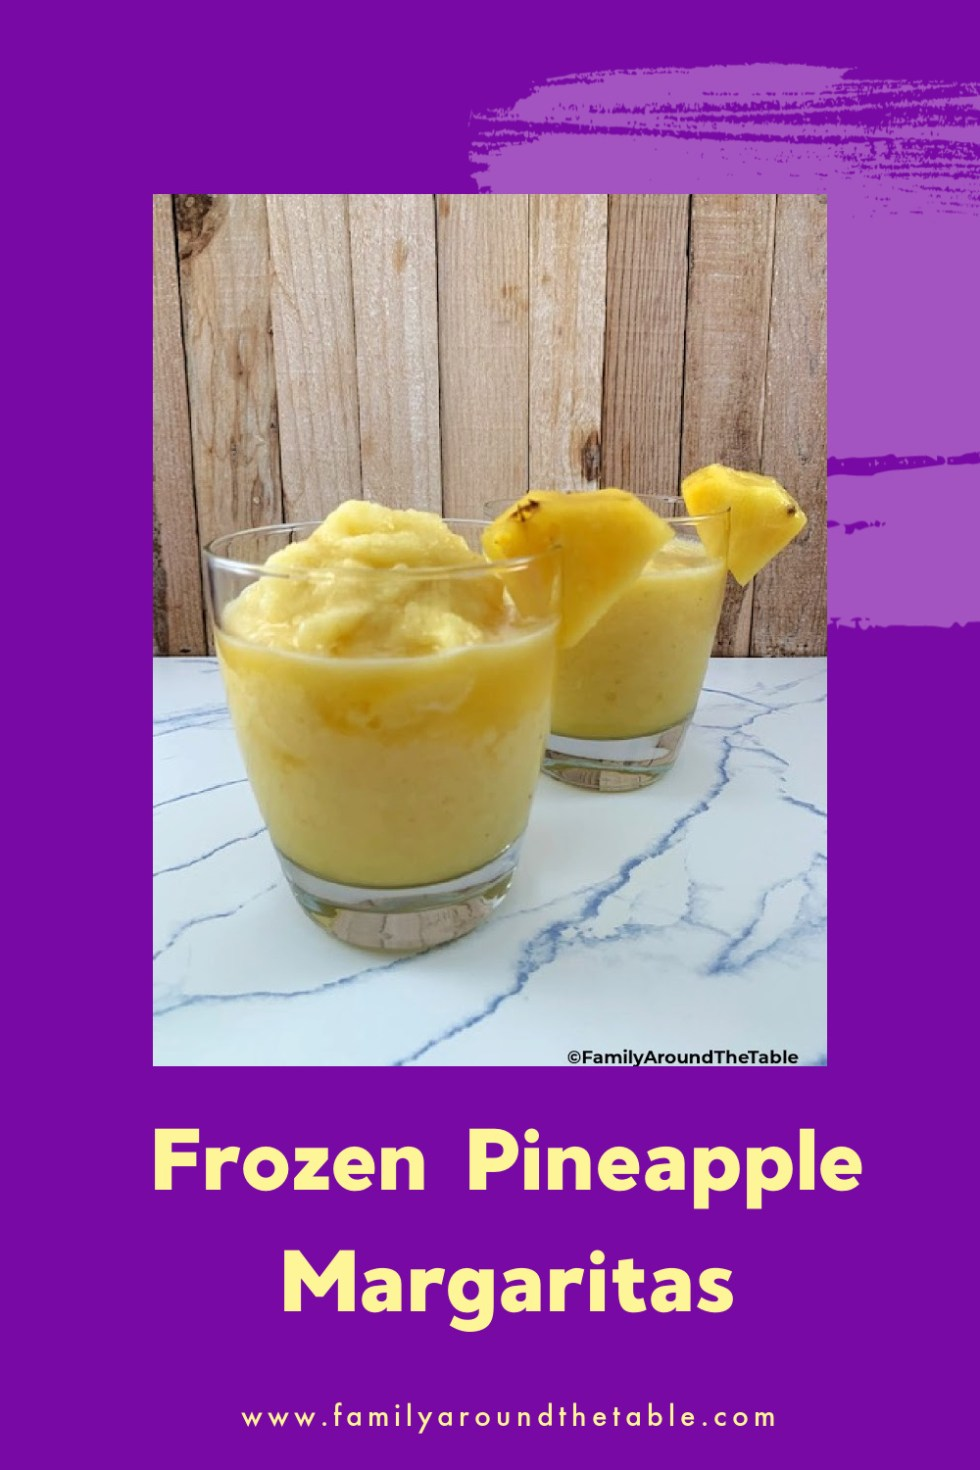 Frozen Pineapple Margaritas Pinterest image.